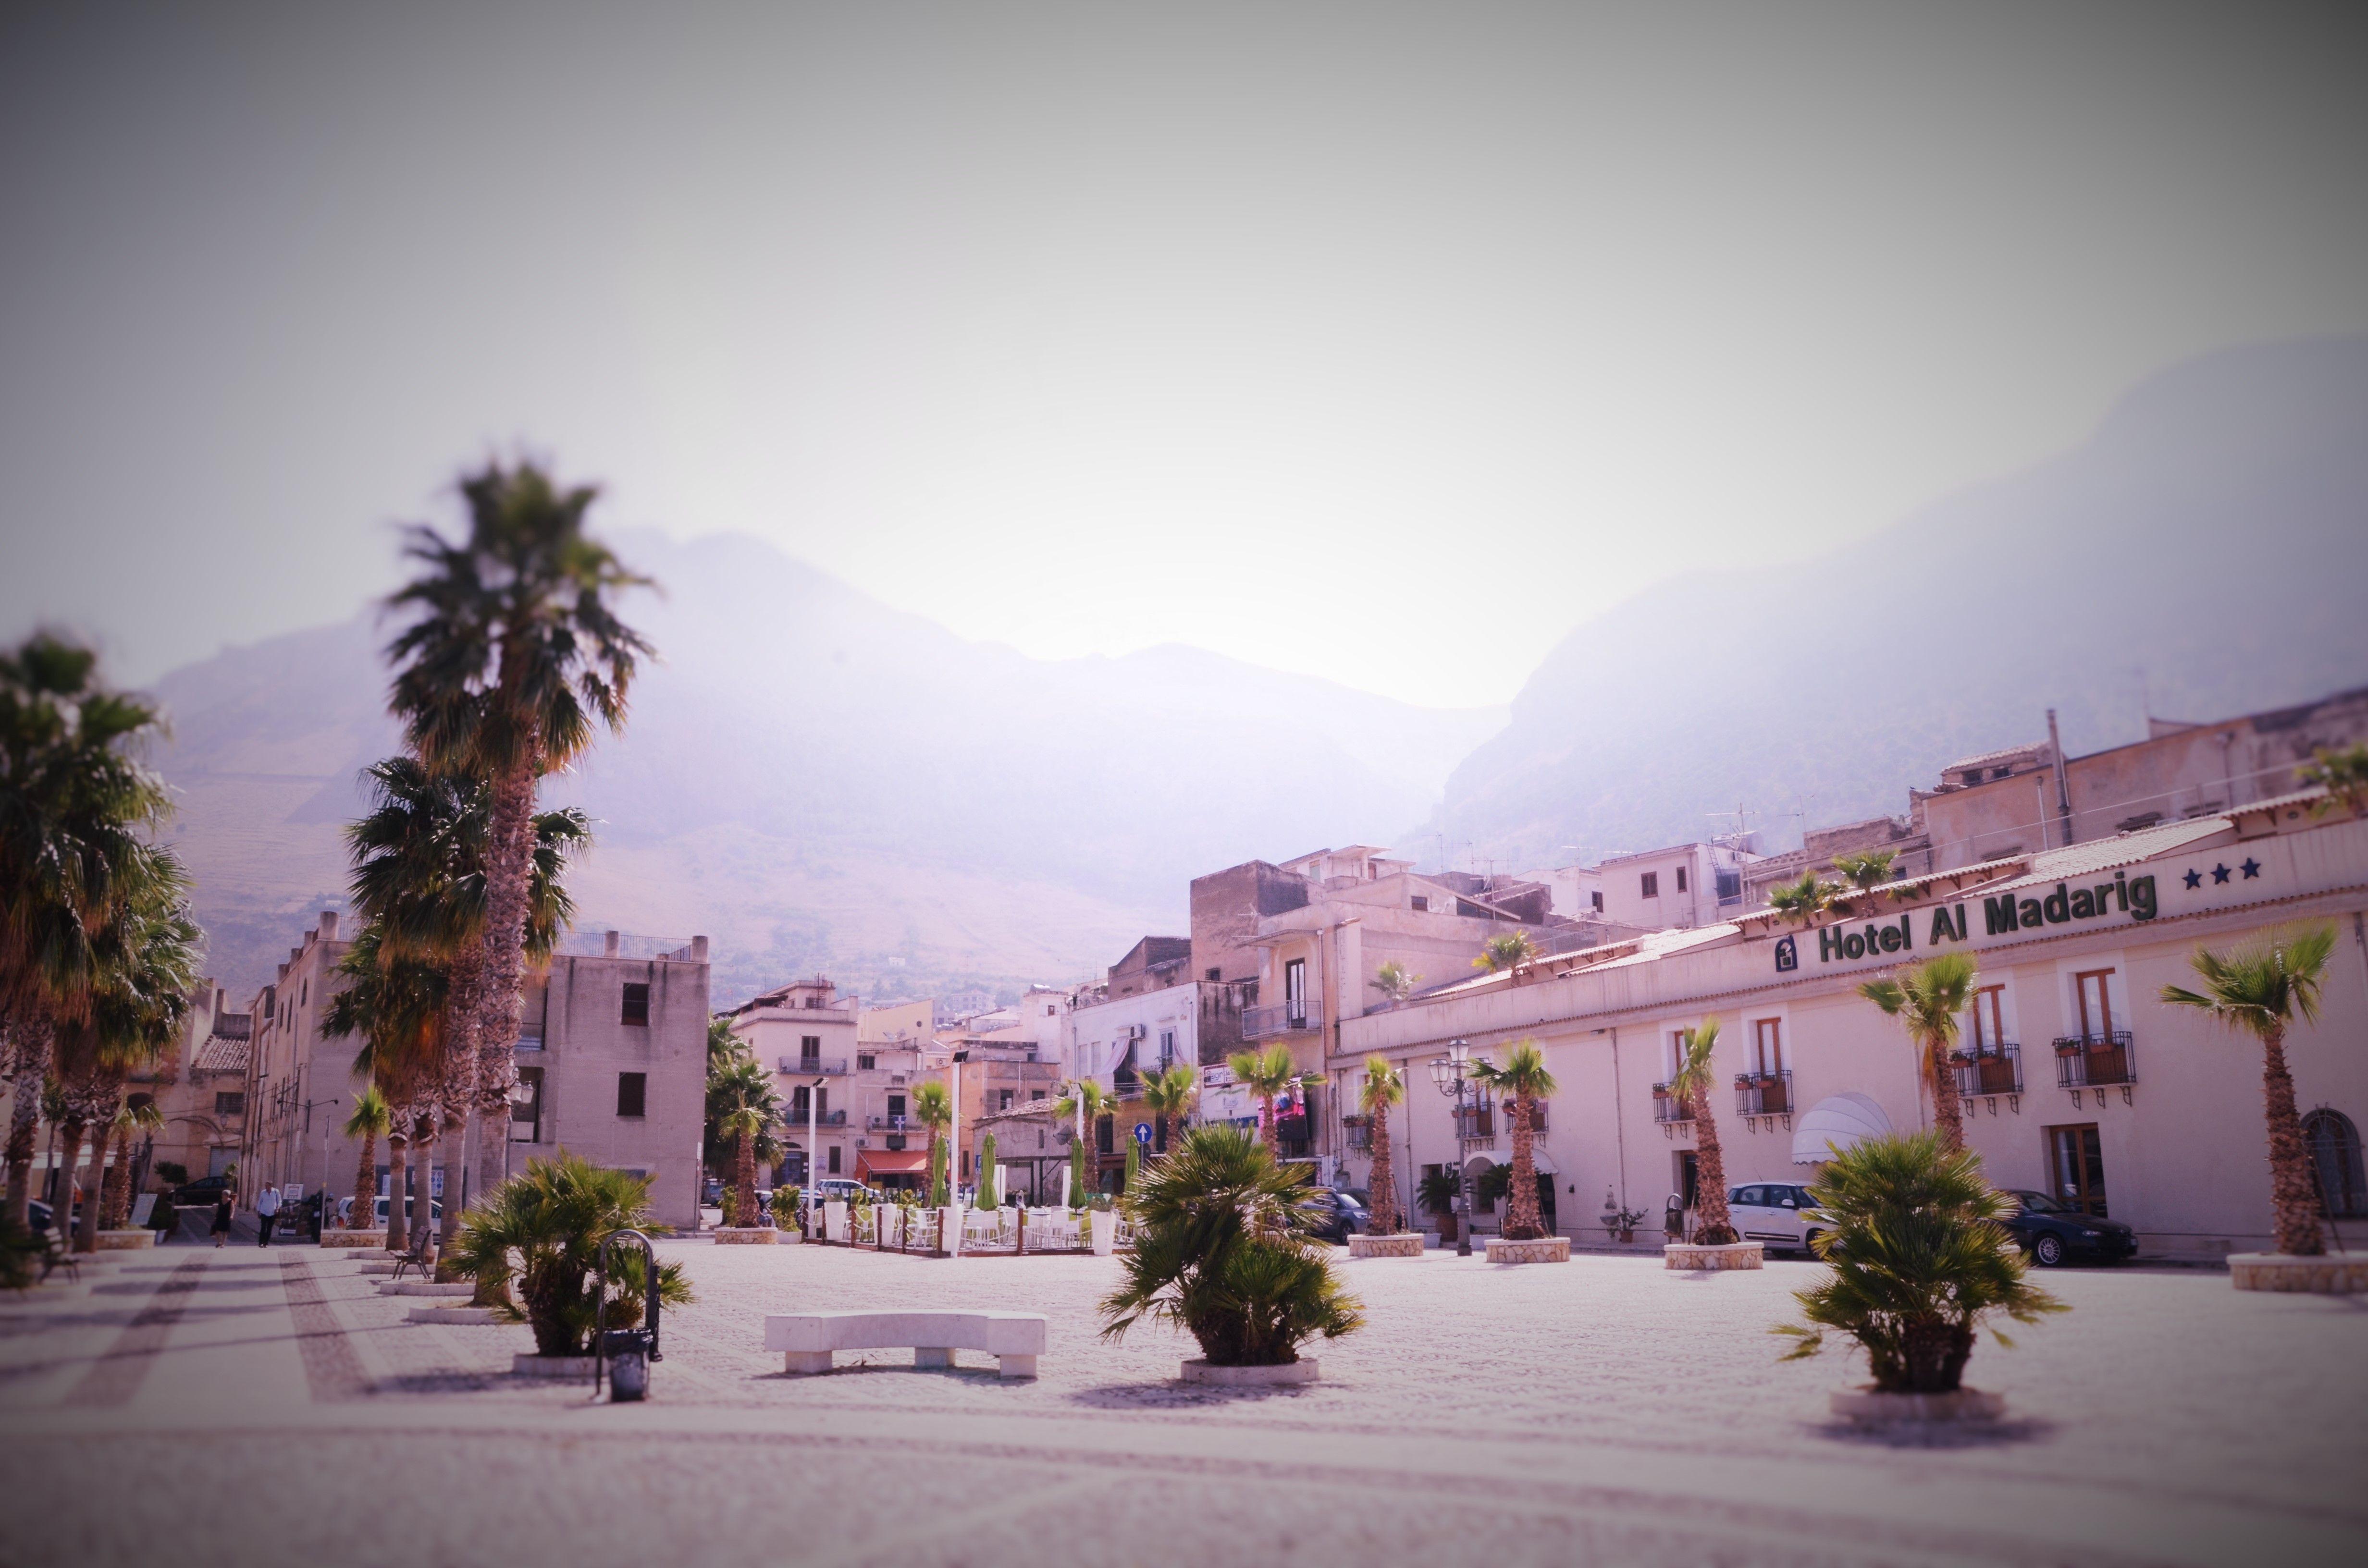 Castellamare Del Golfo, Sicily. www.wetravel-theworld.com